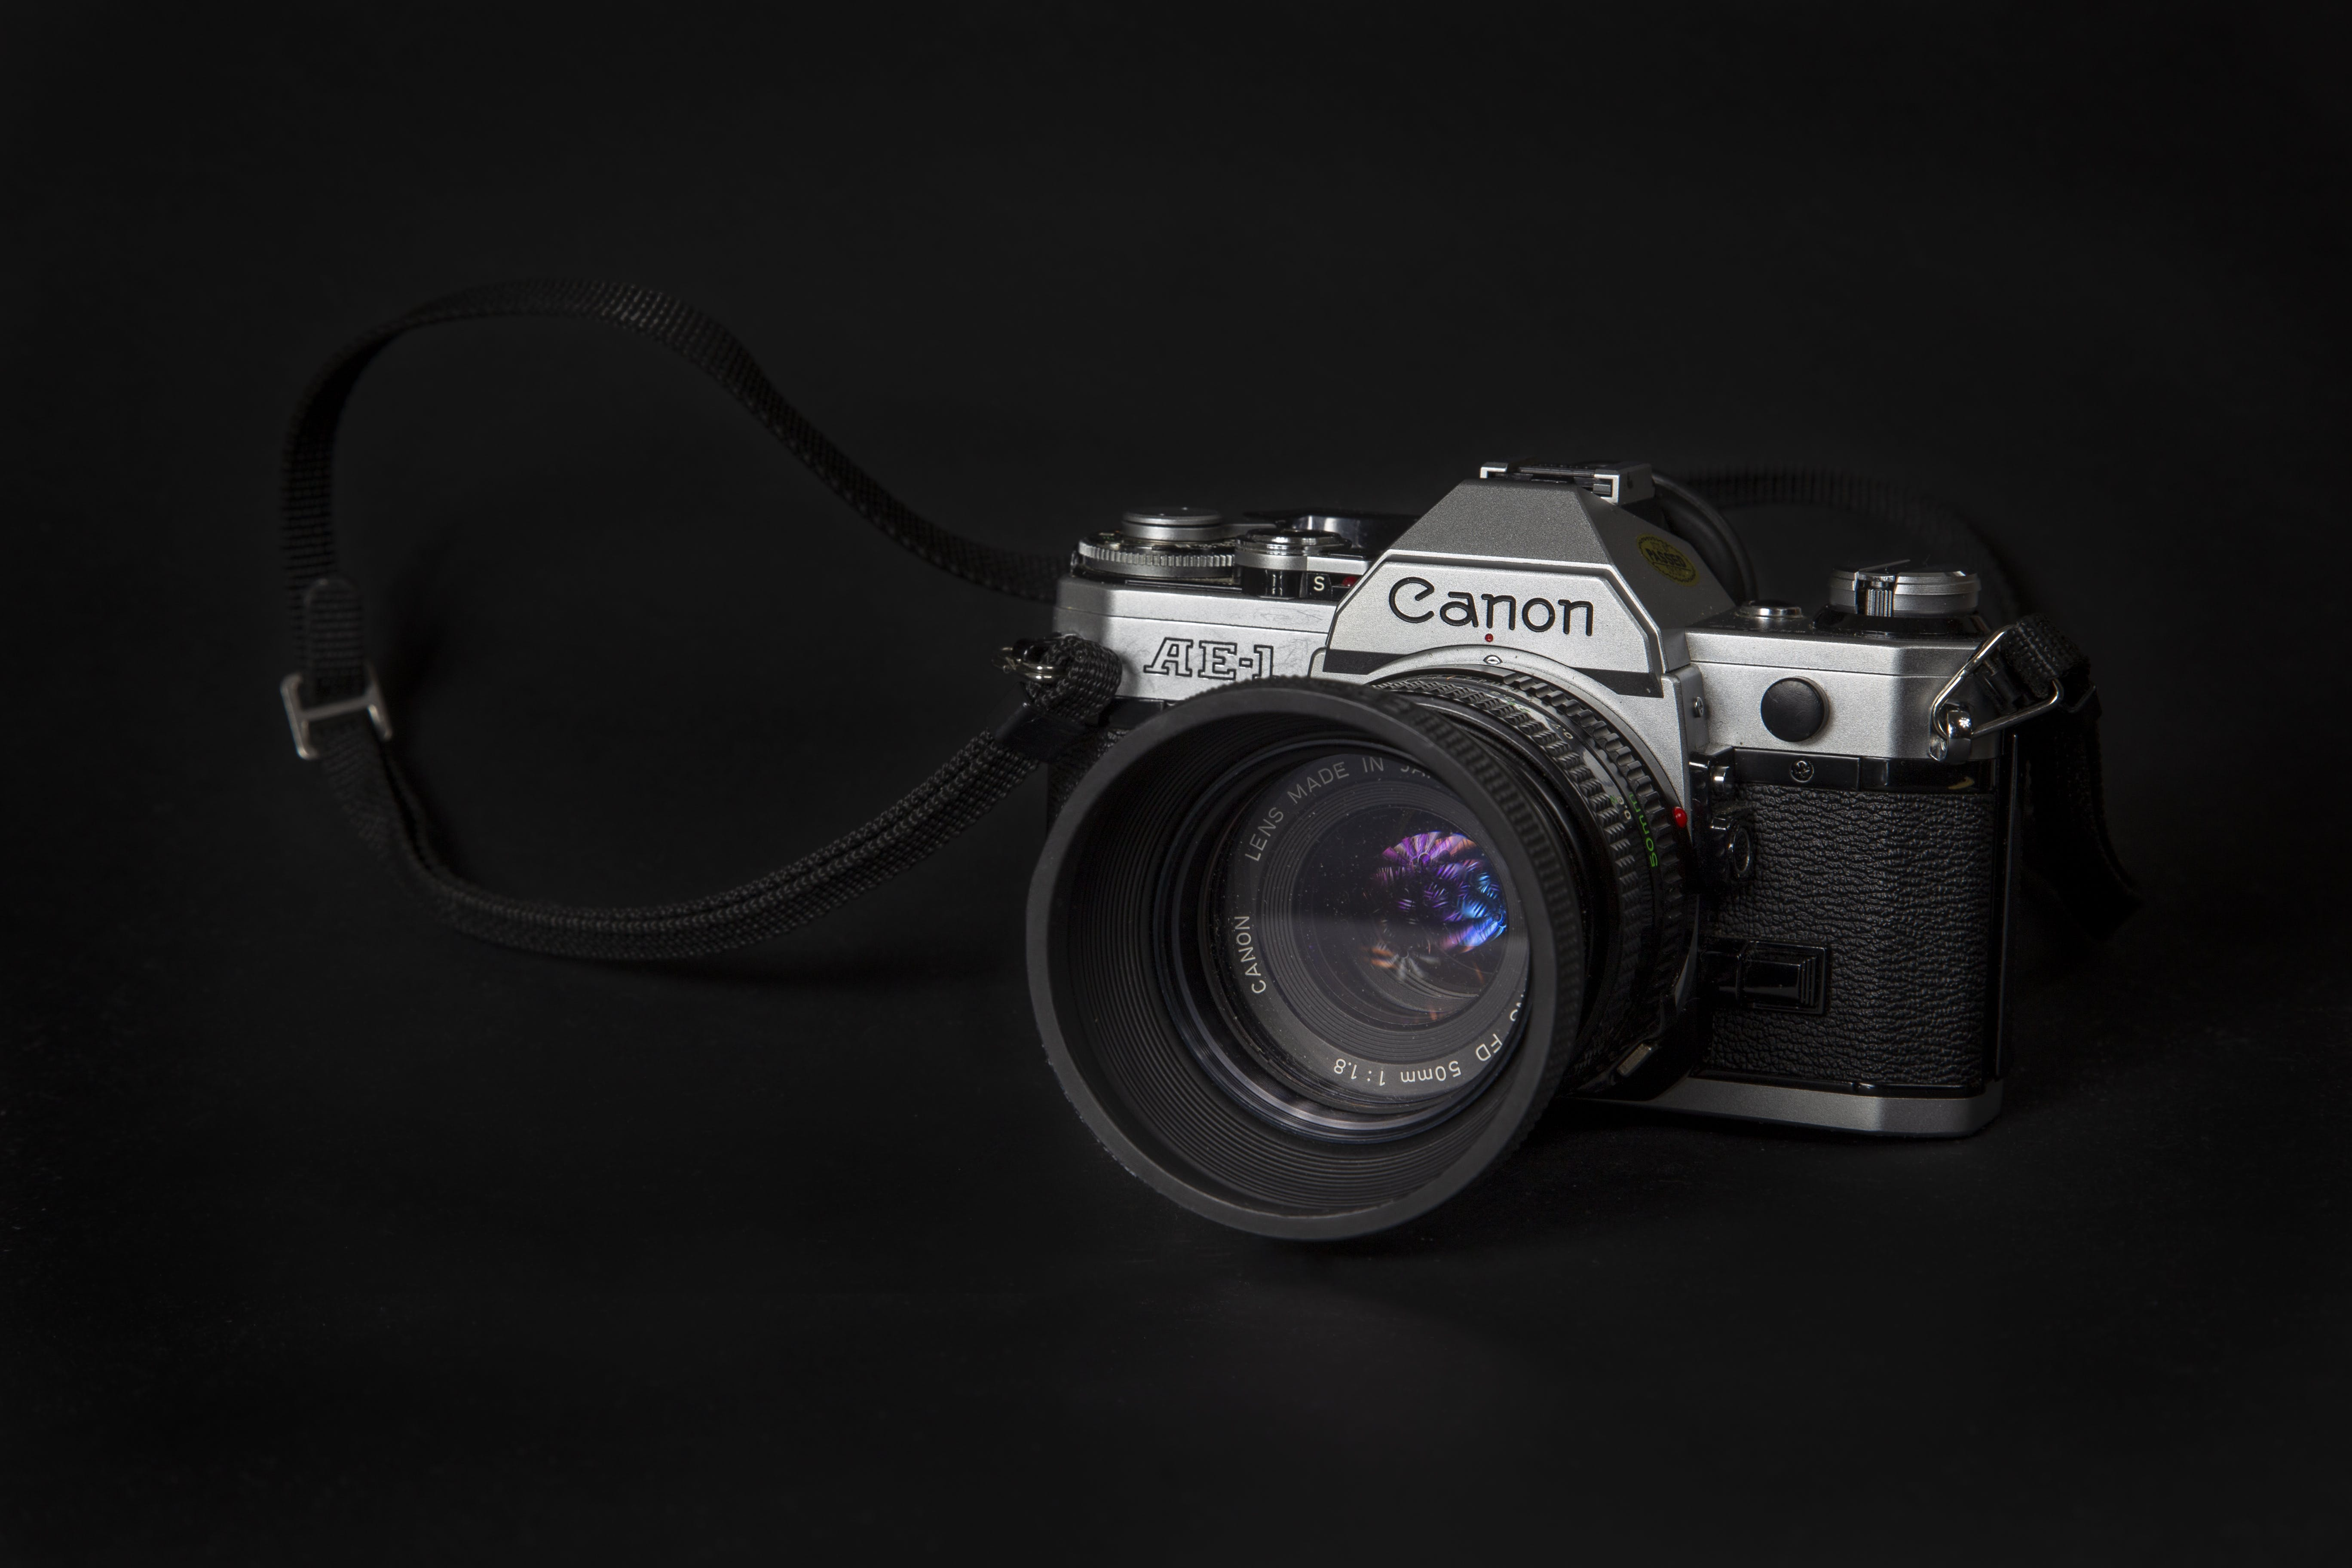 Close-Up Photo of Canon Camera